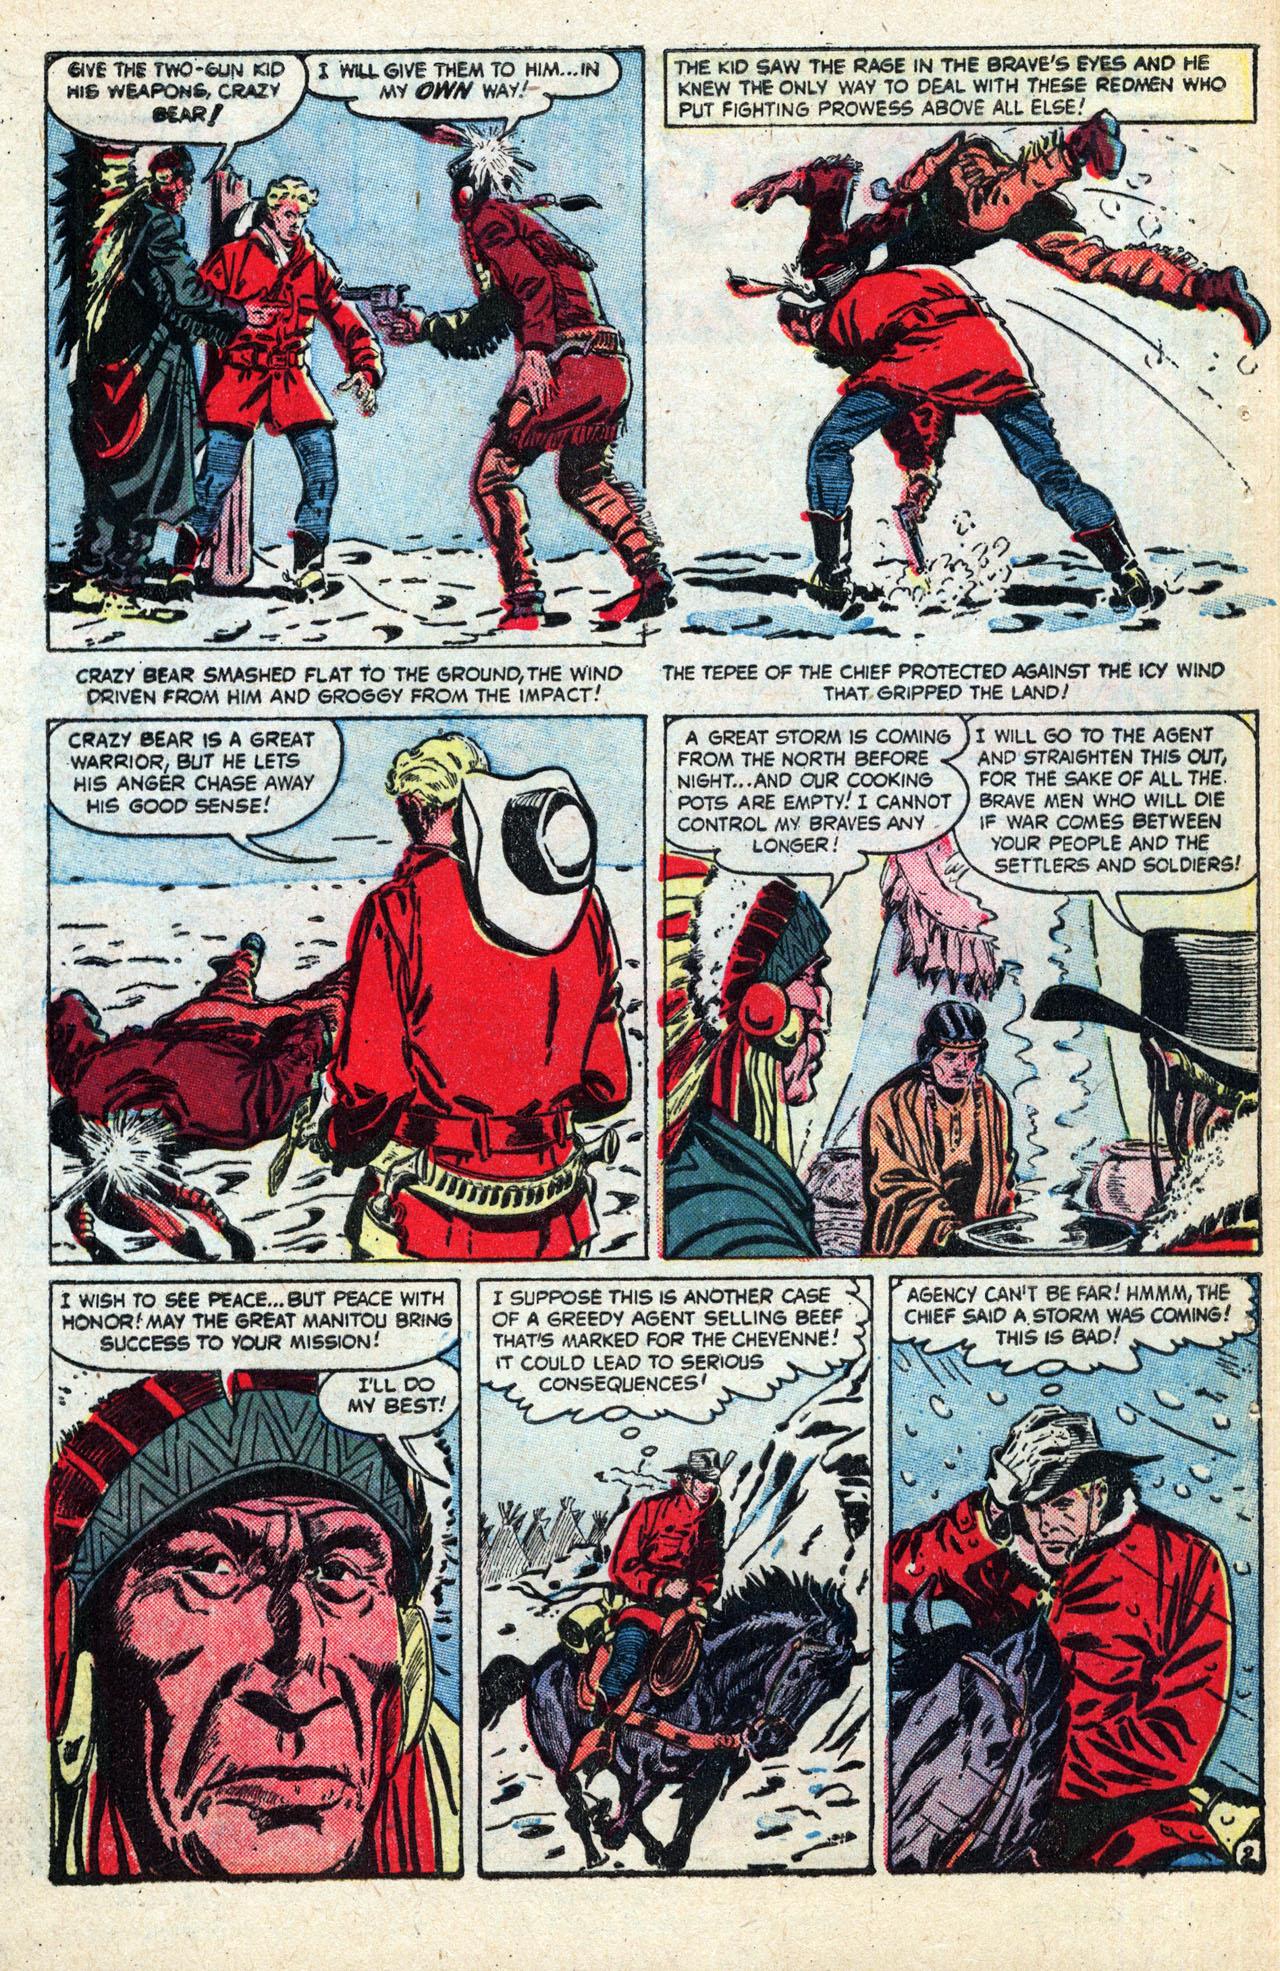 Read online Two-Gun Kid comic -  Issue #27 - 28